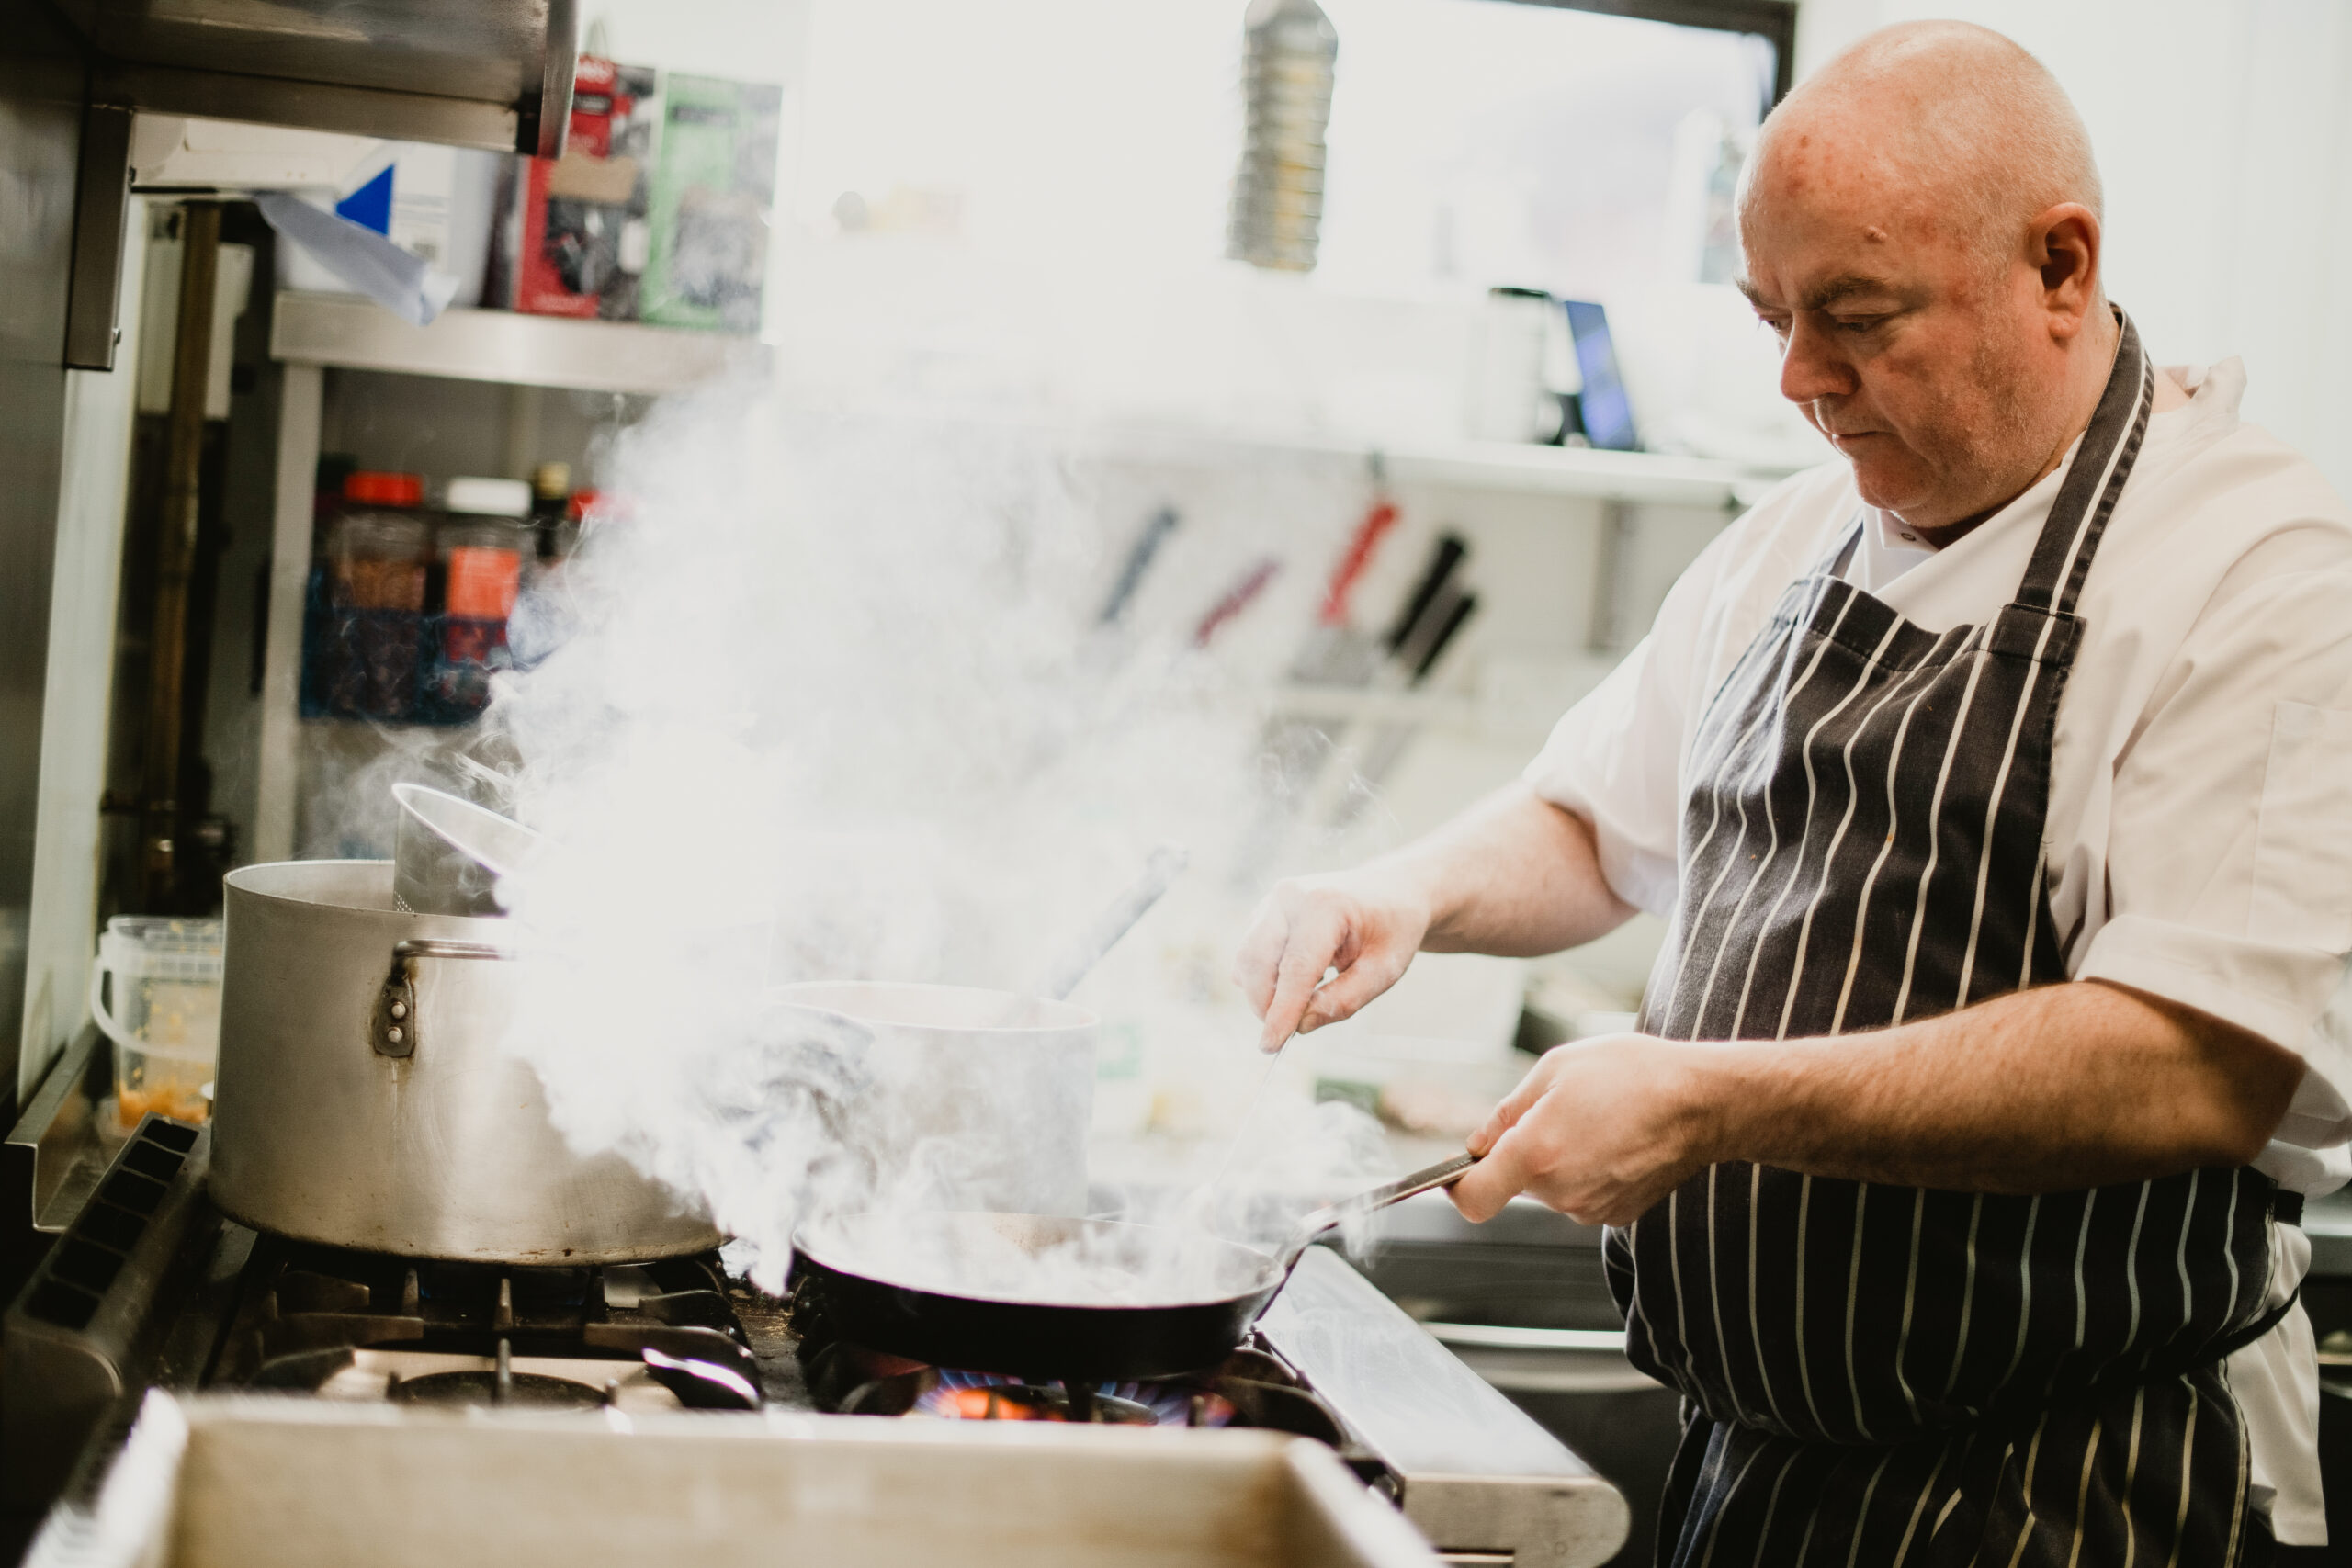 Padrig Jones inside the Pizzeria Villaggio kitchen in Cardiff